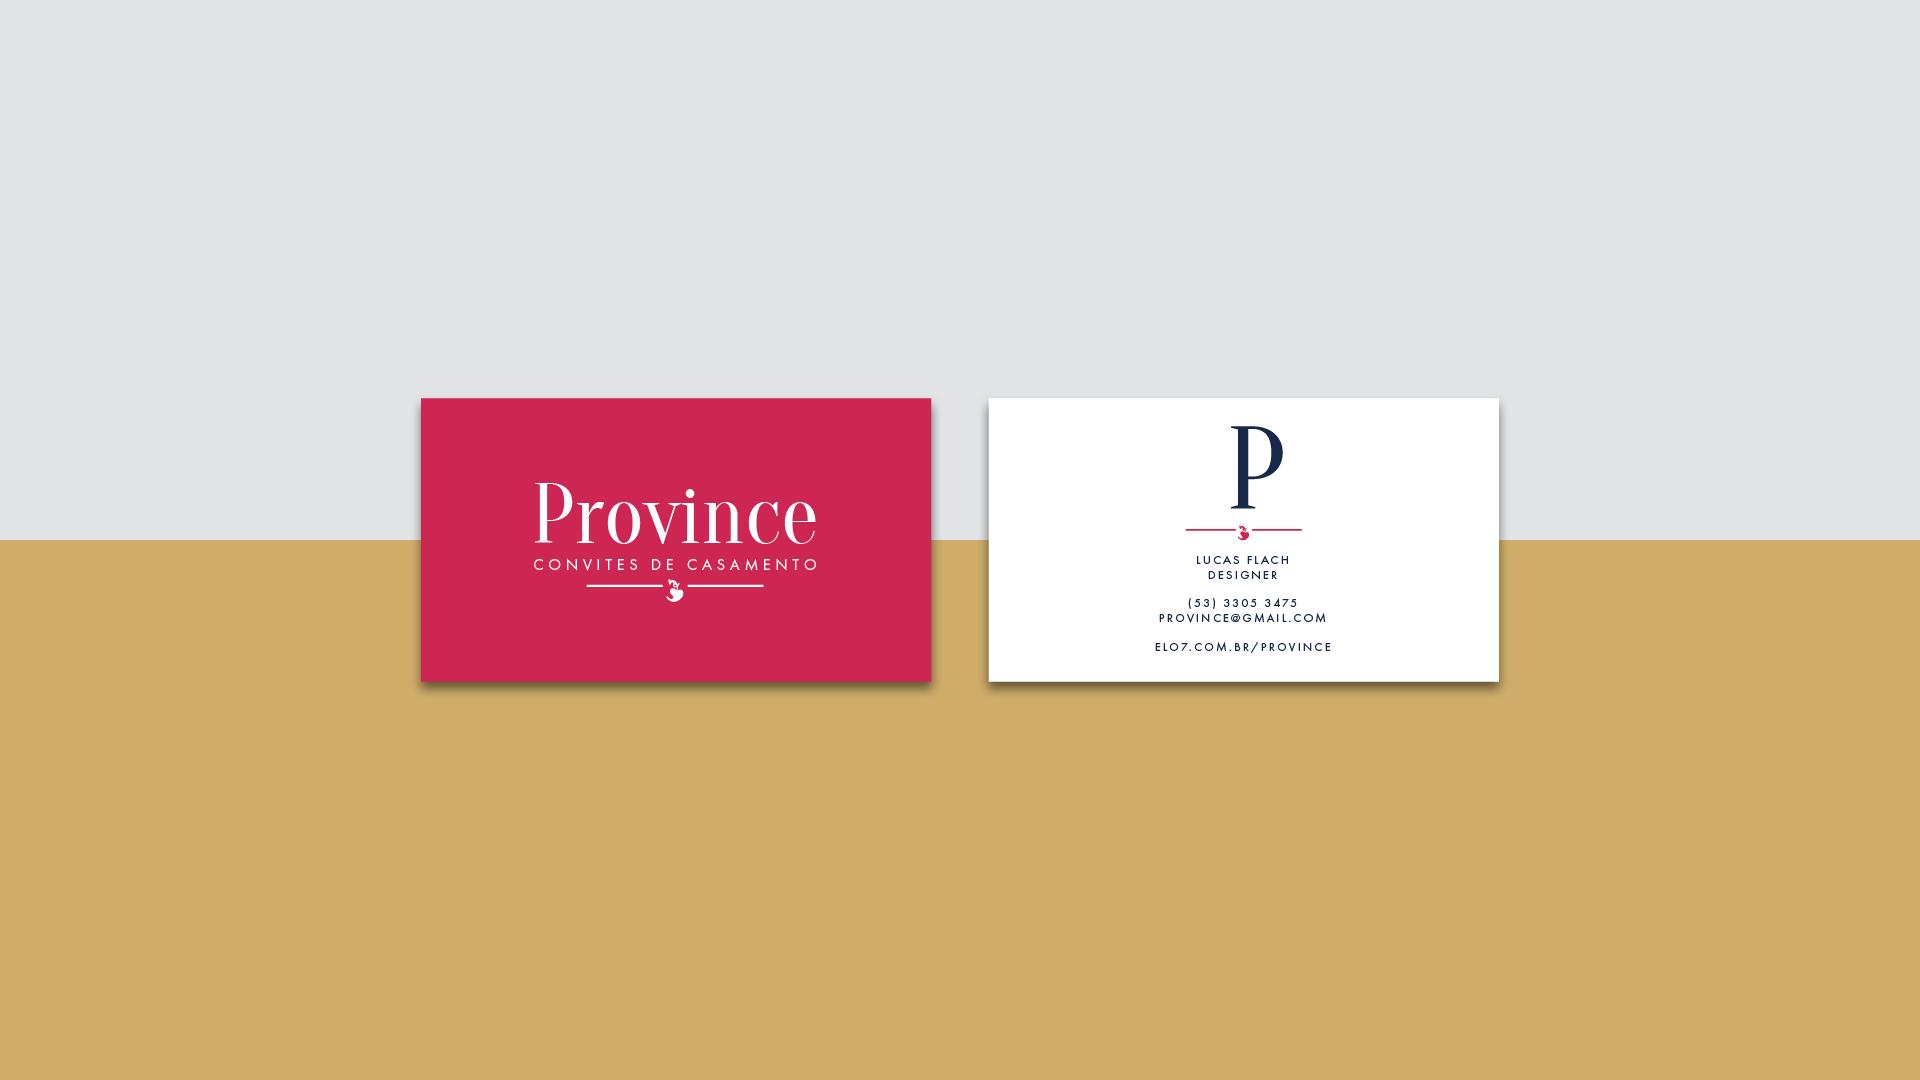 Perfect Wedding Invitation Mail Image - Invitations and ...